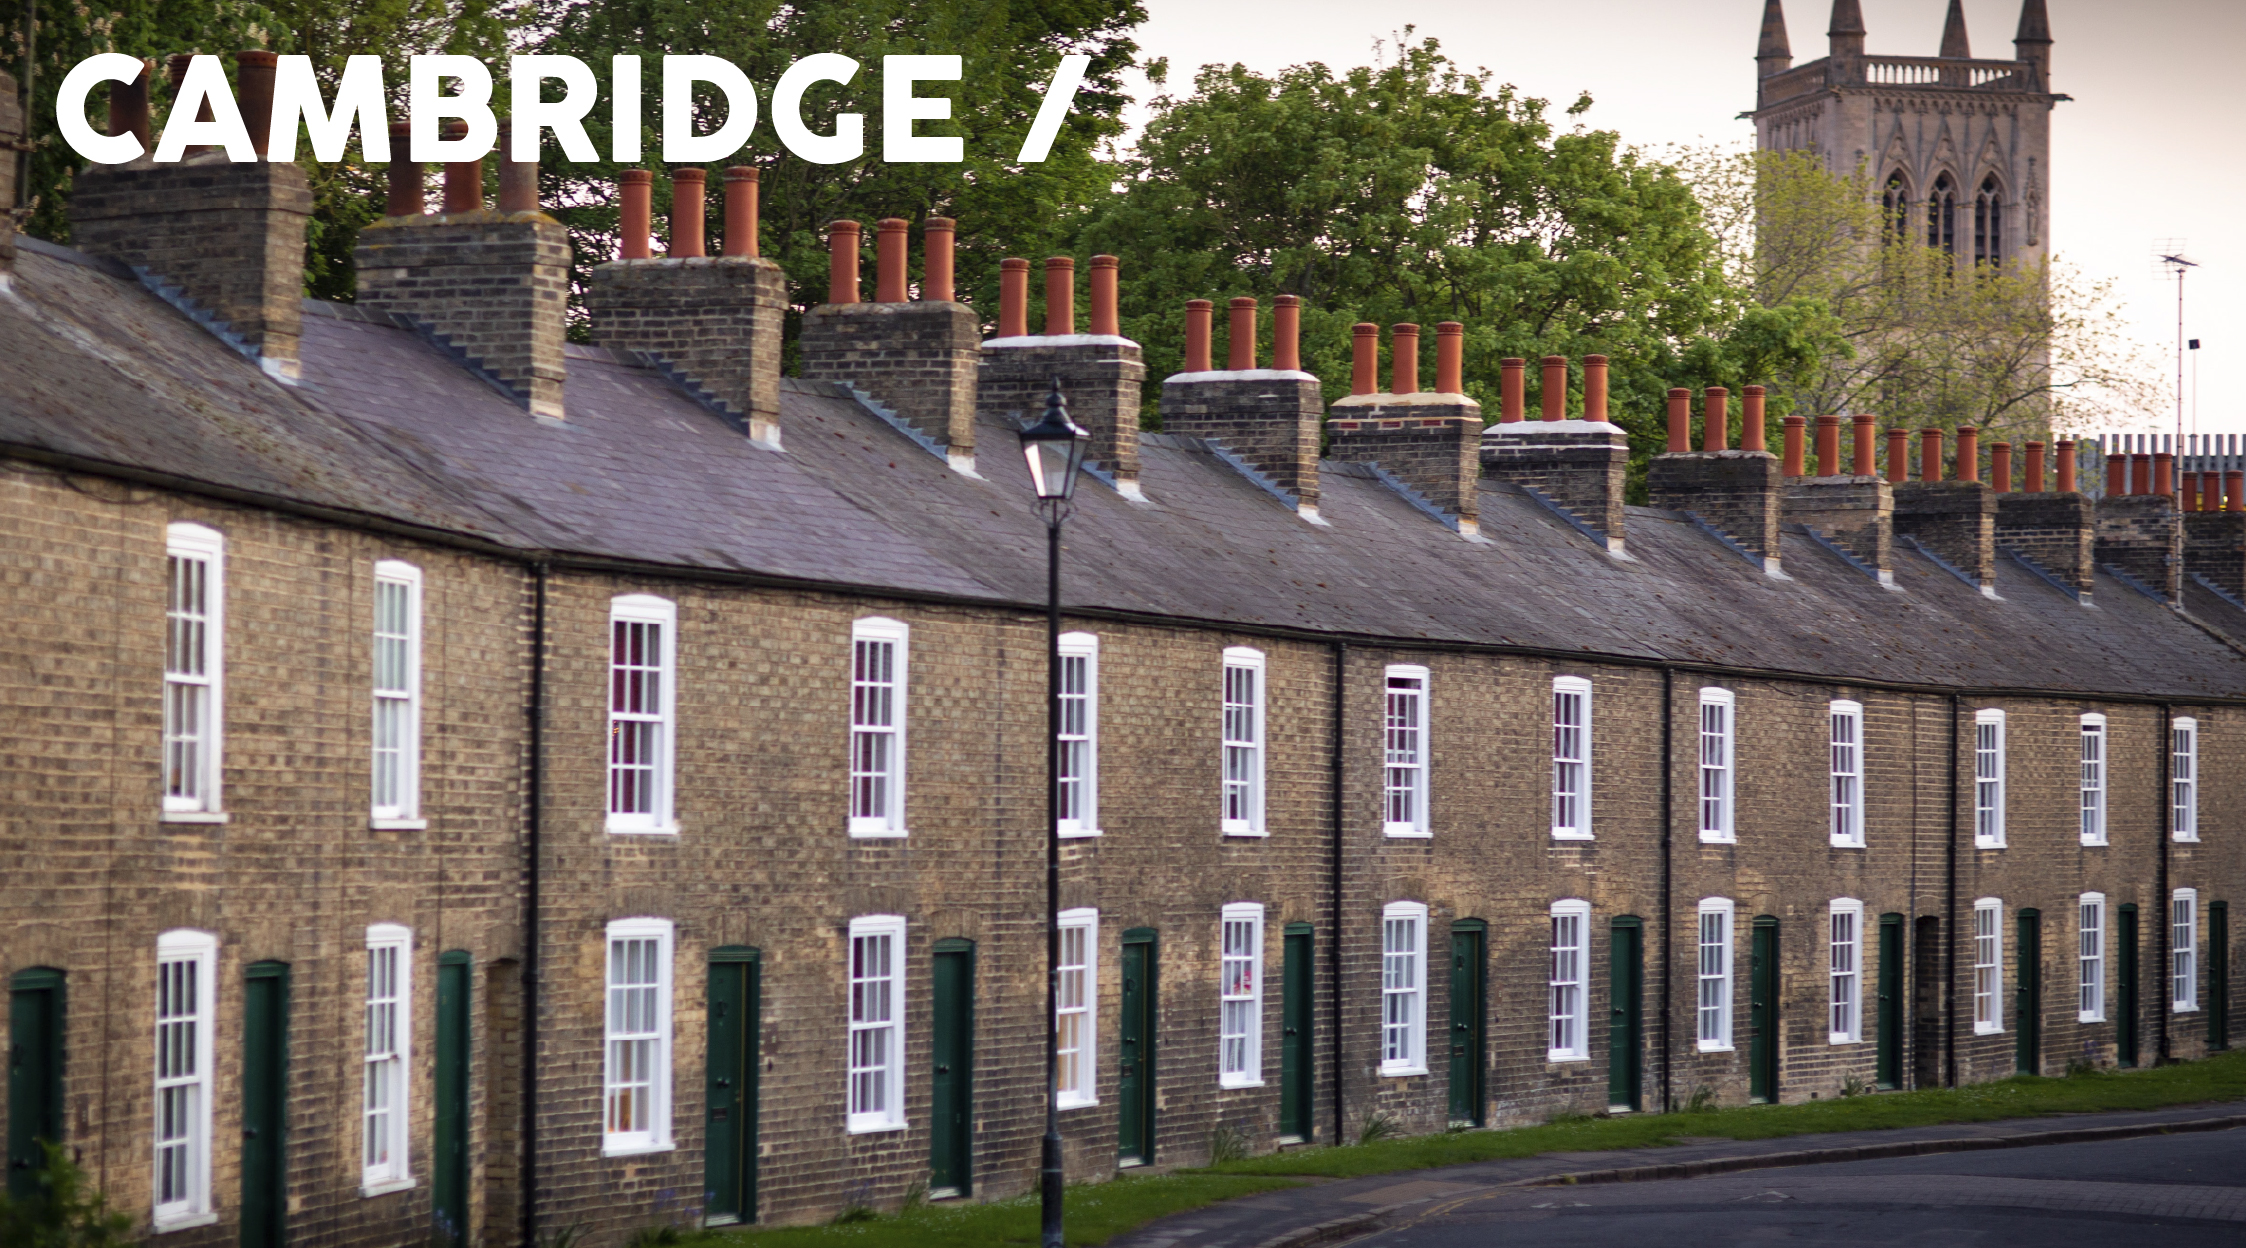 51 Degrees North - CAMBRIDGE - Banner